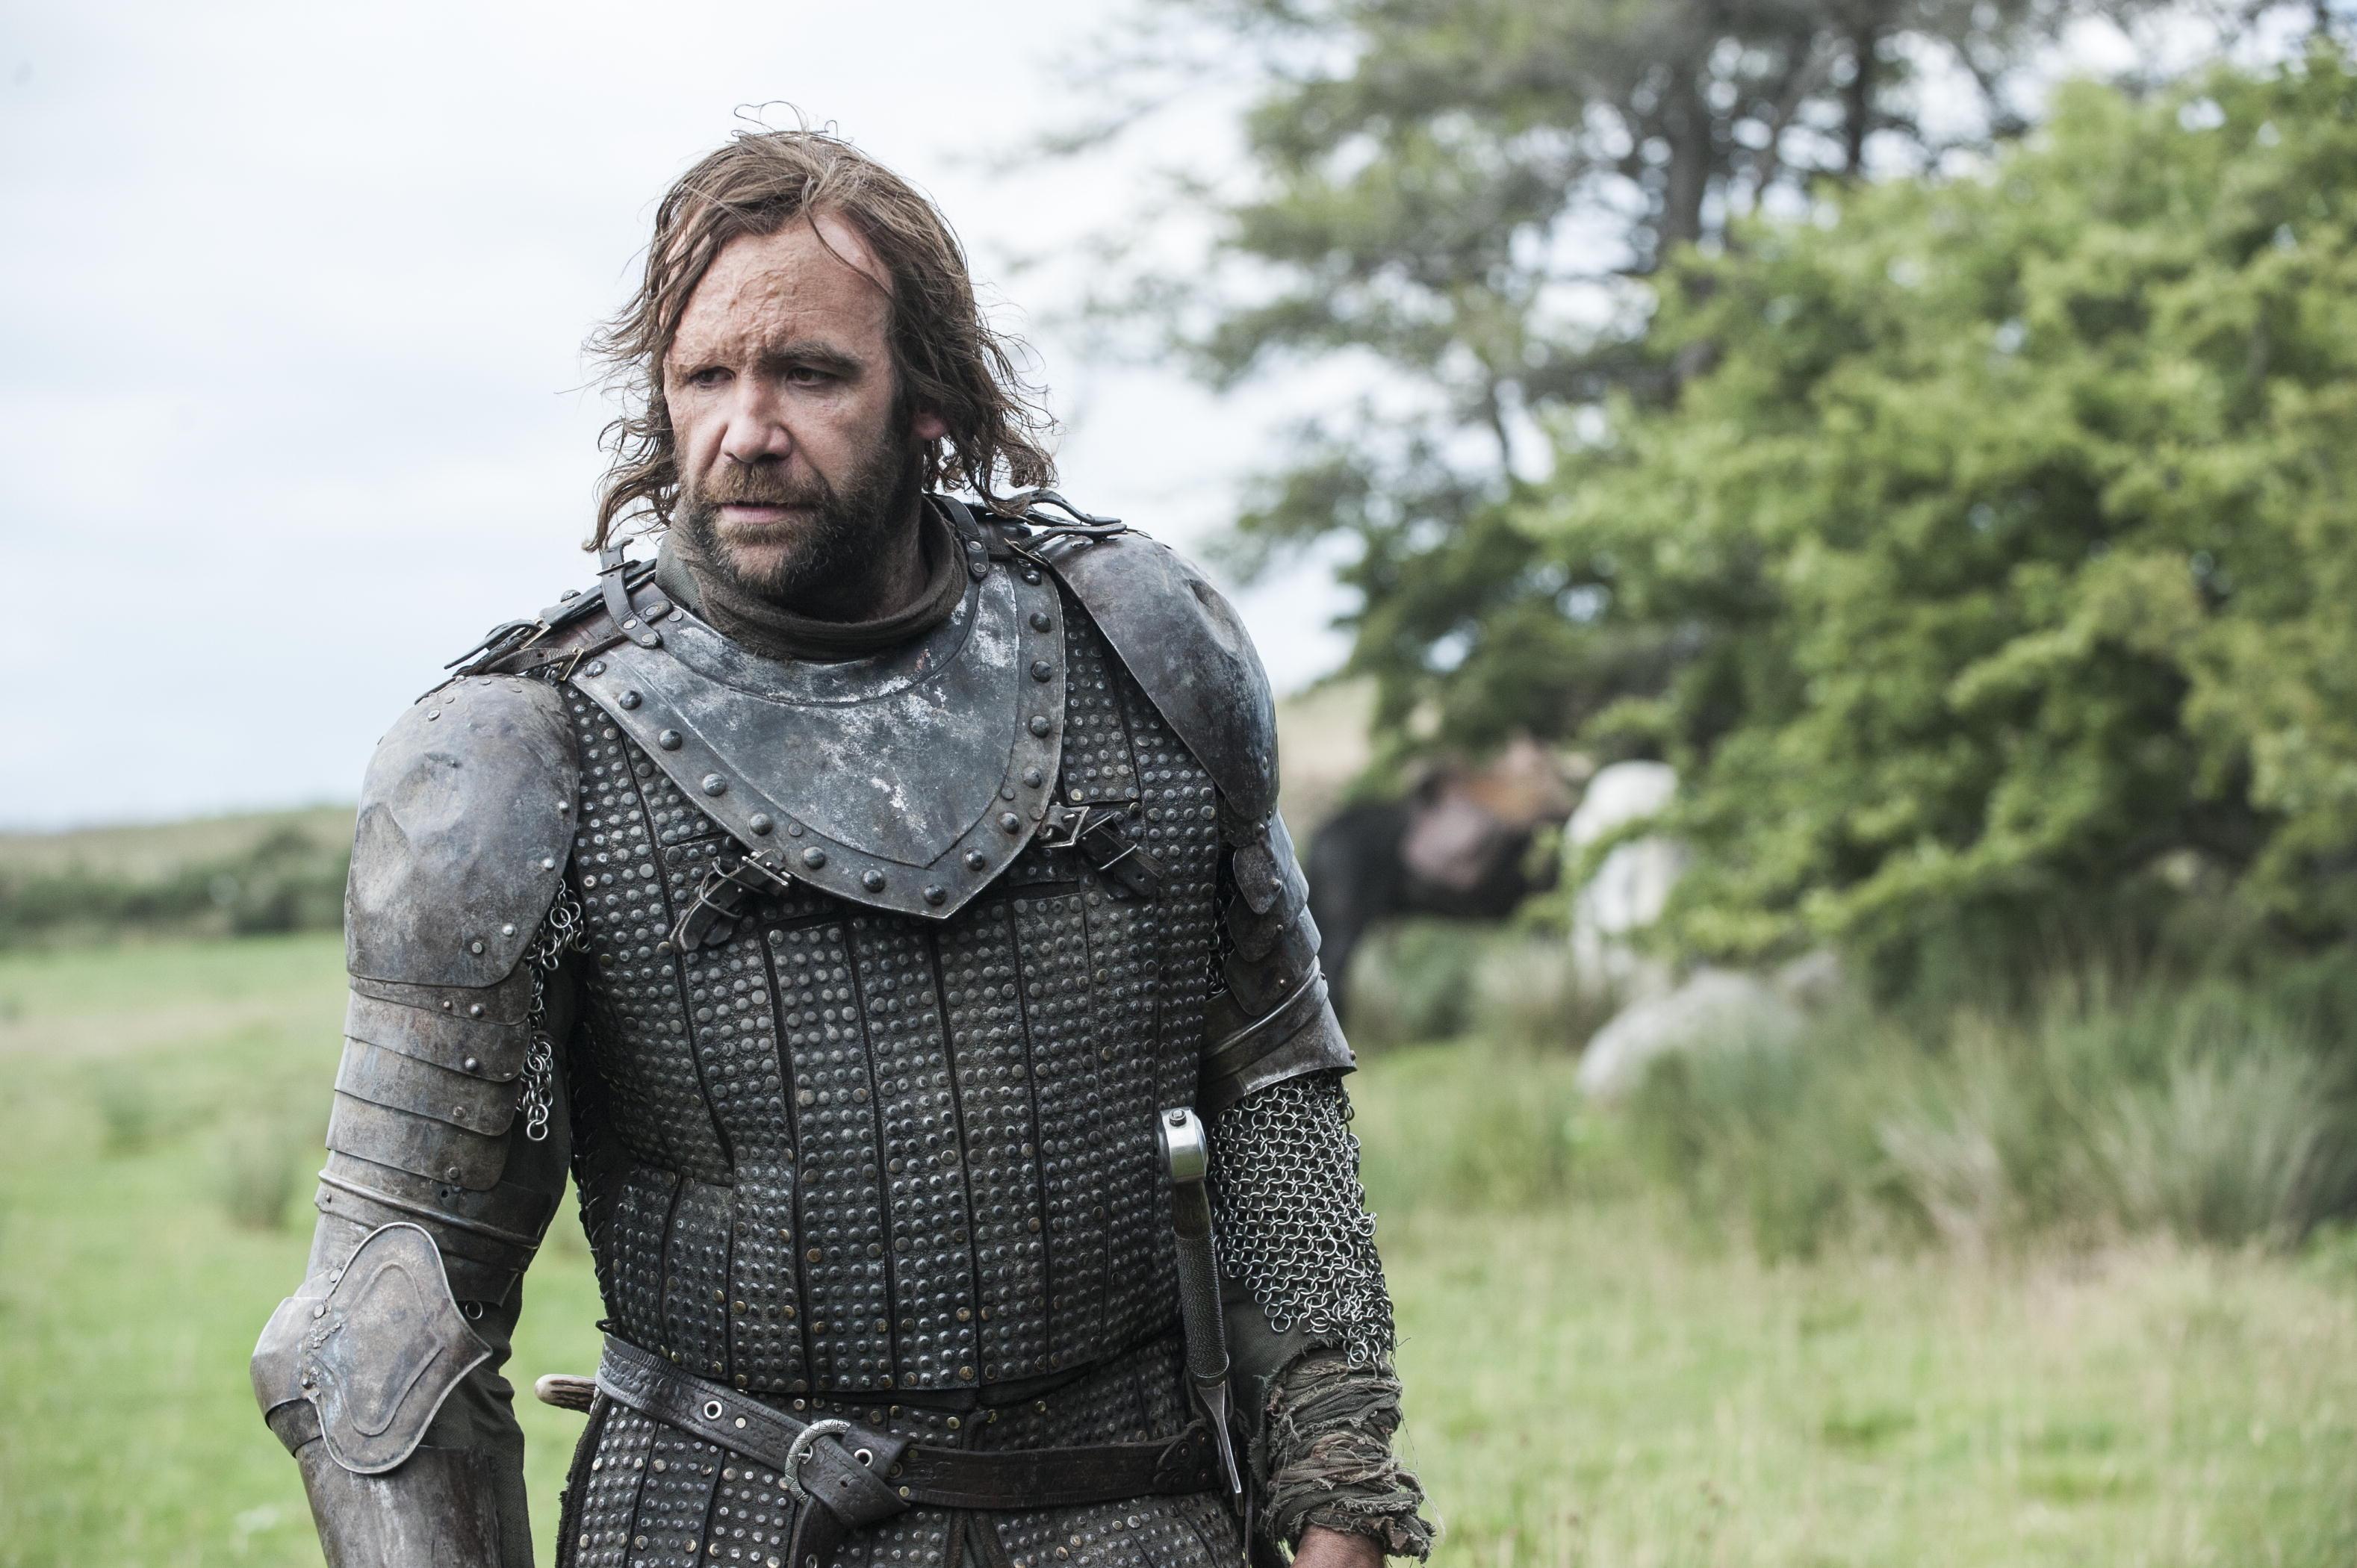 Game-of-Thrones-season-4-Rory-McCann-Sandor-'The Hound'-Clegane